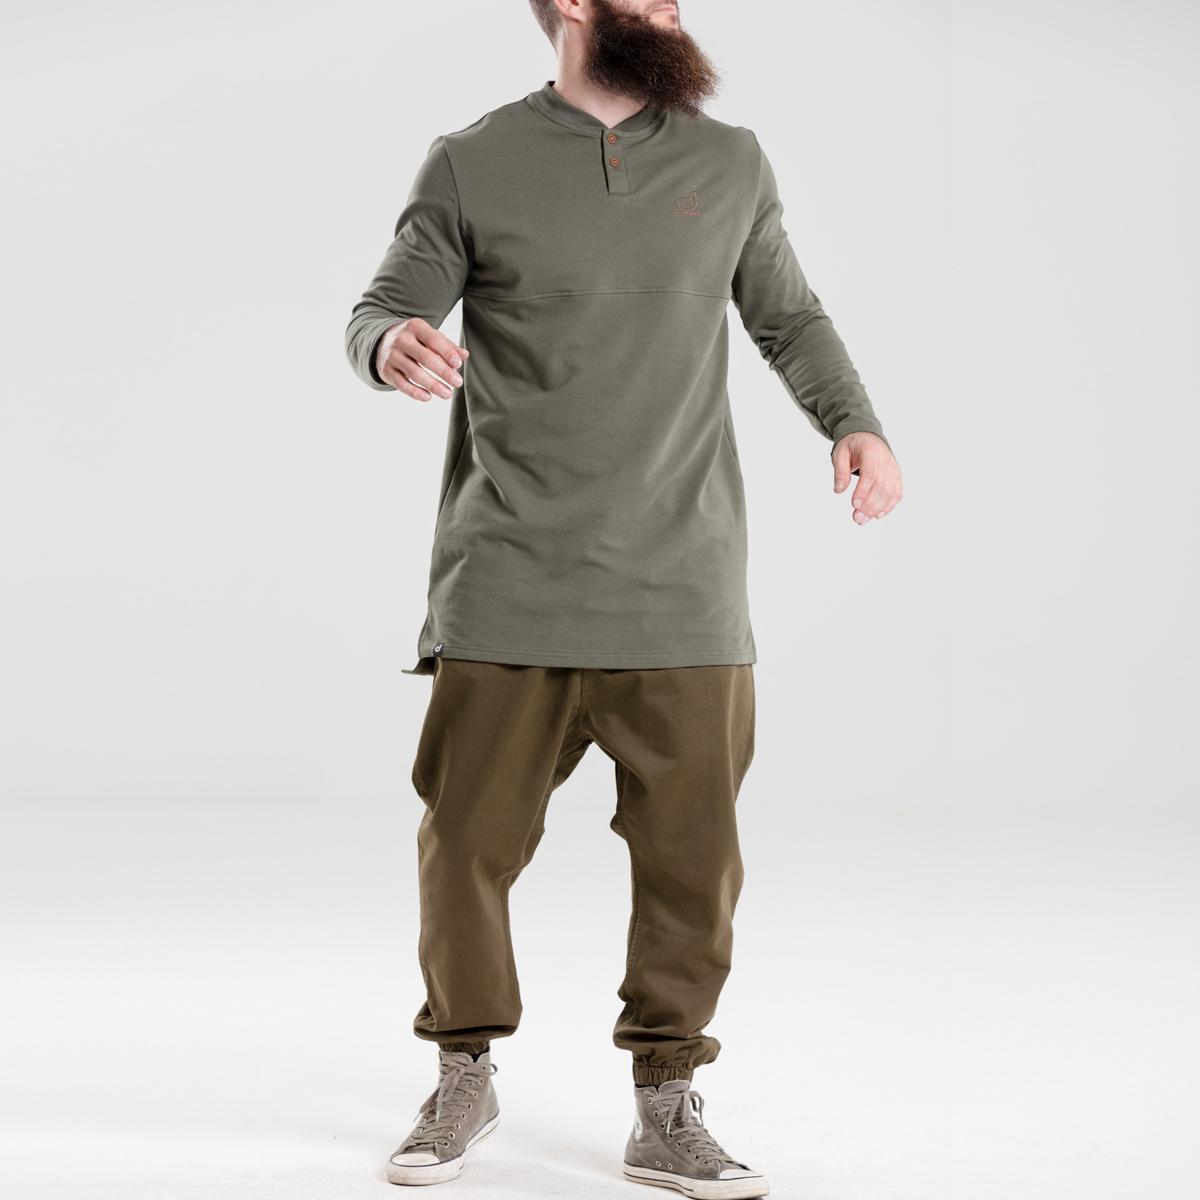 saroual jeans usual kaki dcjeans ensemble face